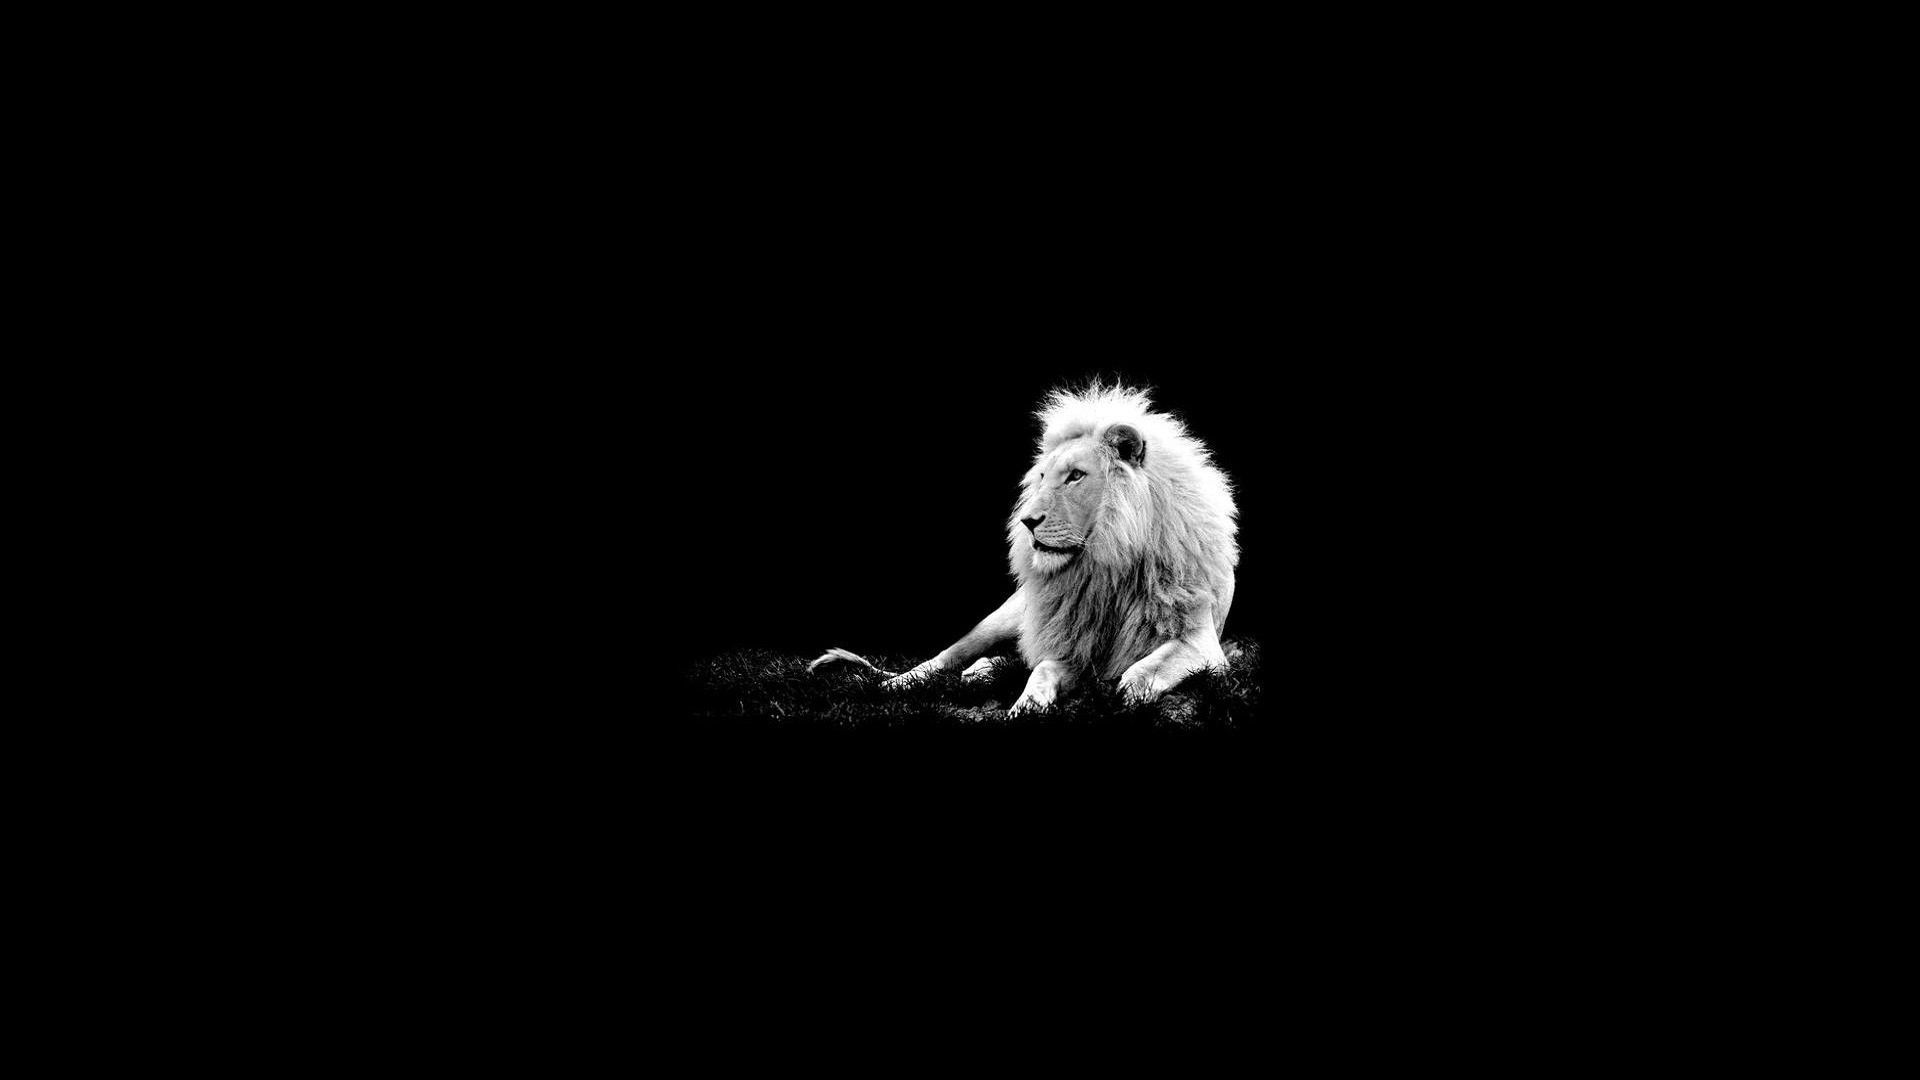 Snow Leopard Black And White Portrait Hd Desktop Wallpaper Dark Wallpaper Hd Wallpaper Lion